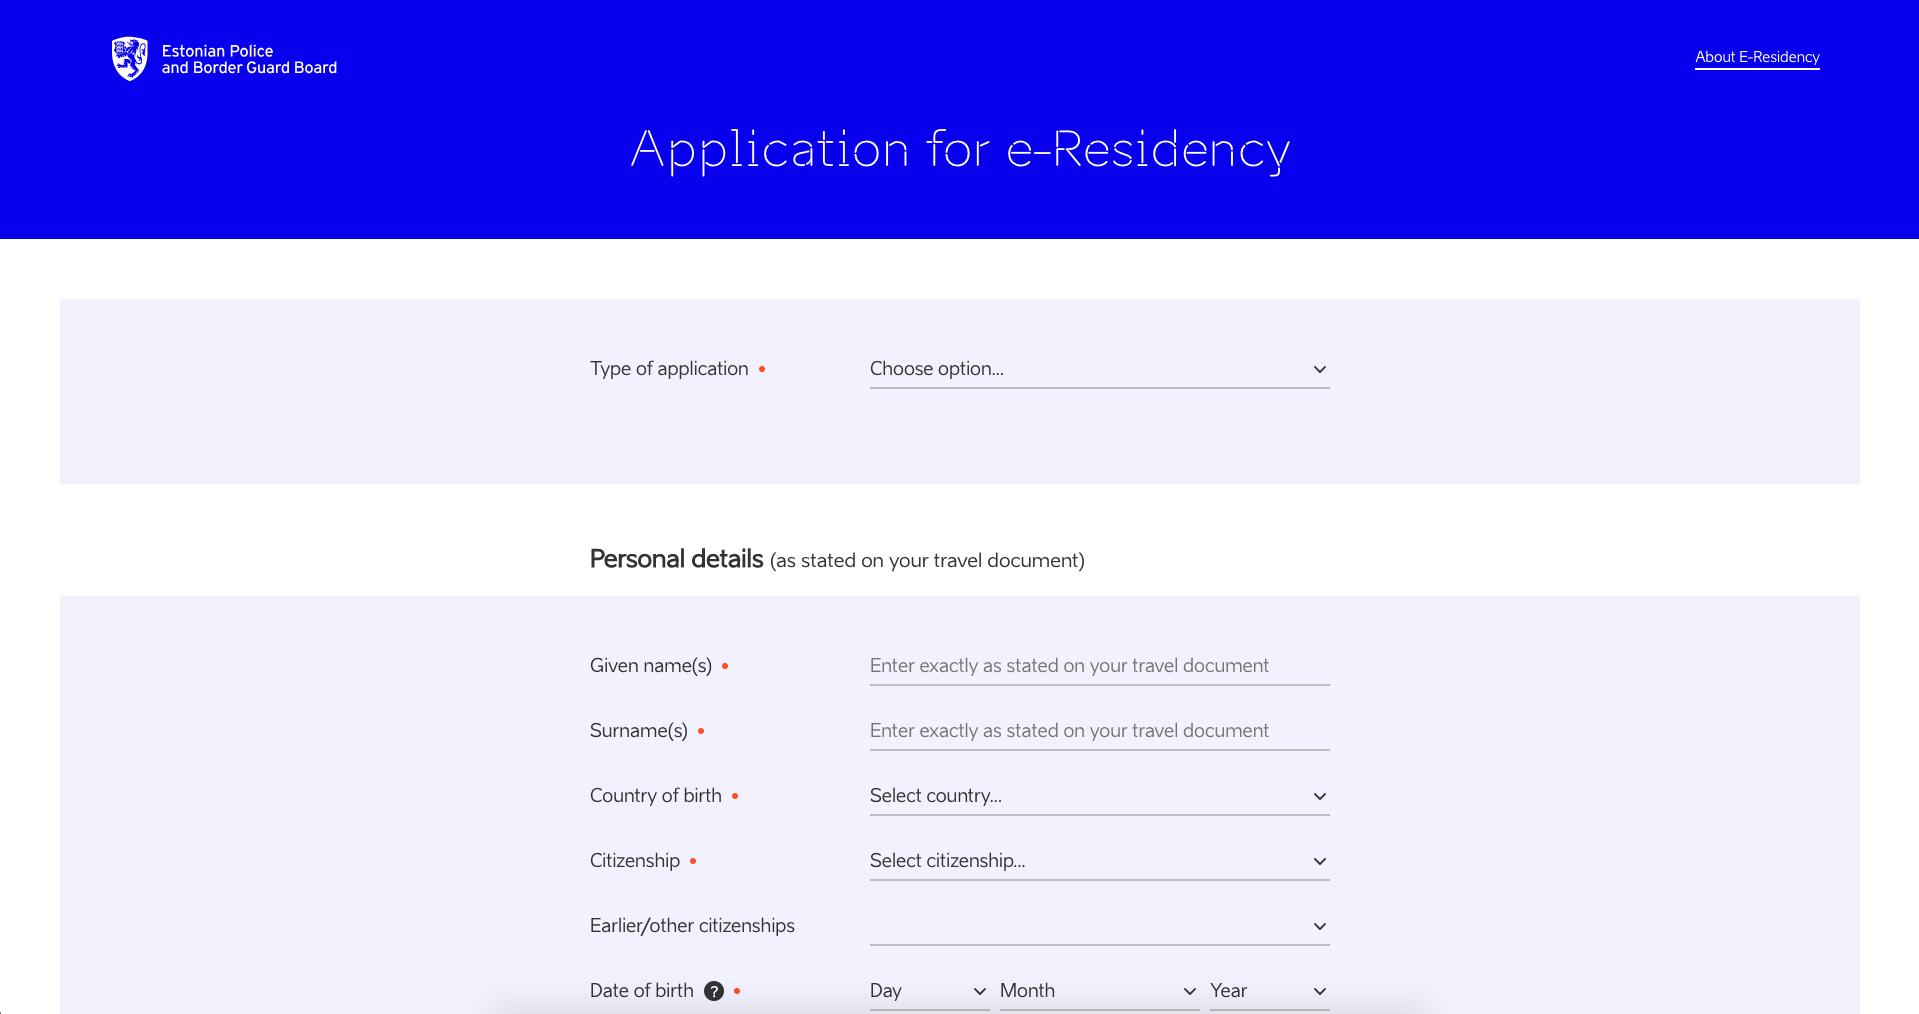 e-Residency application form